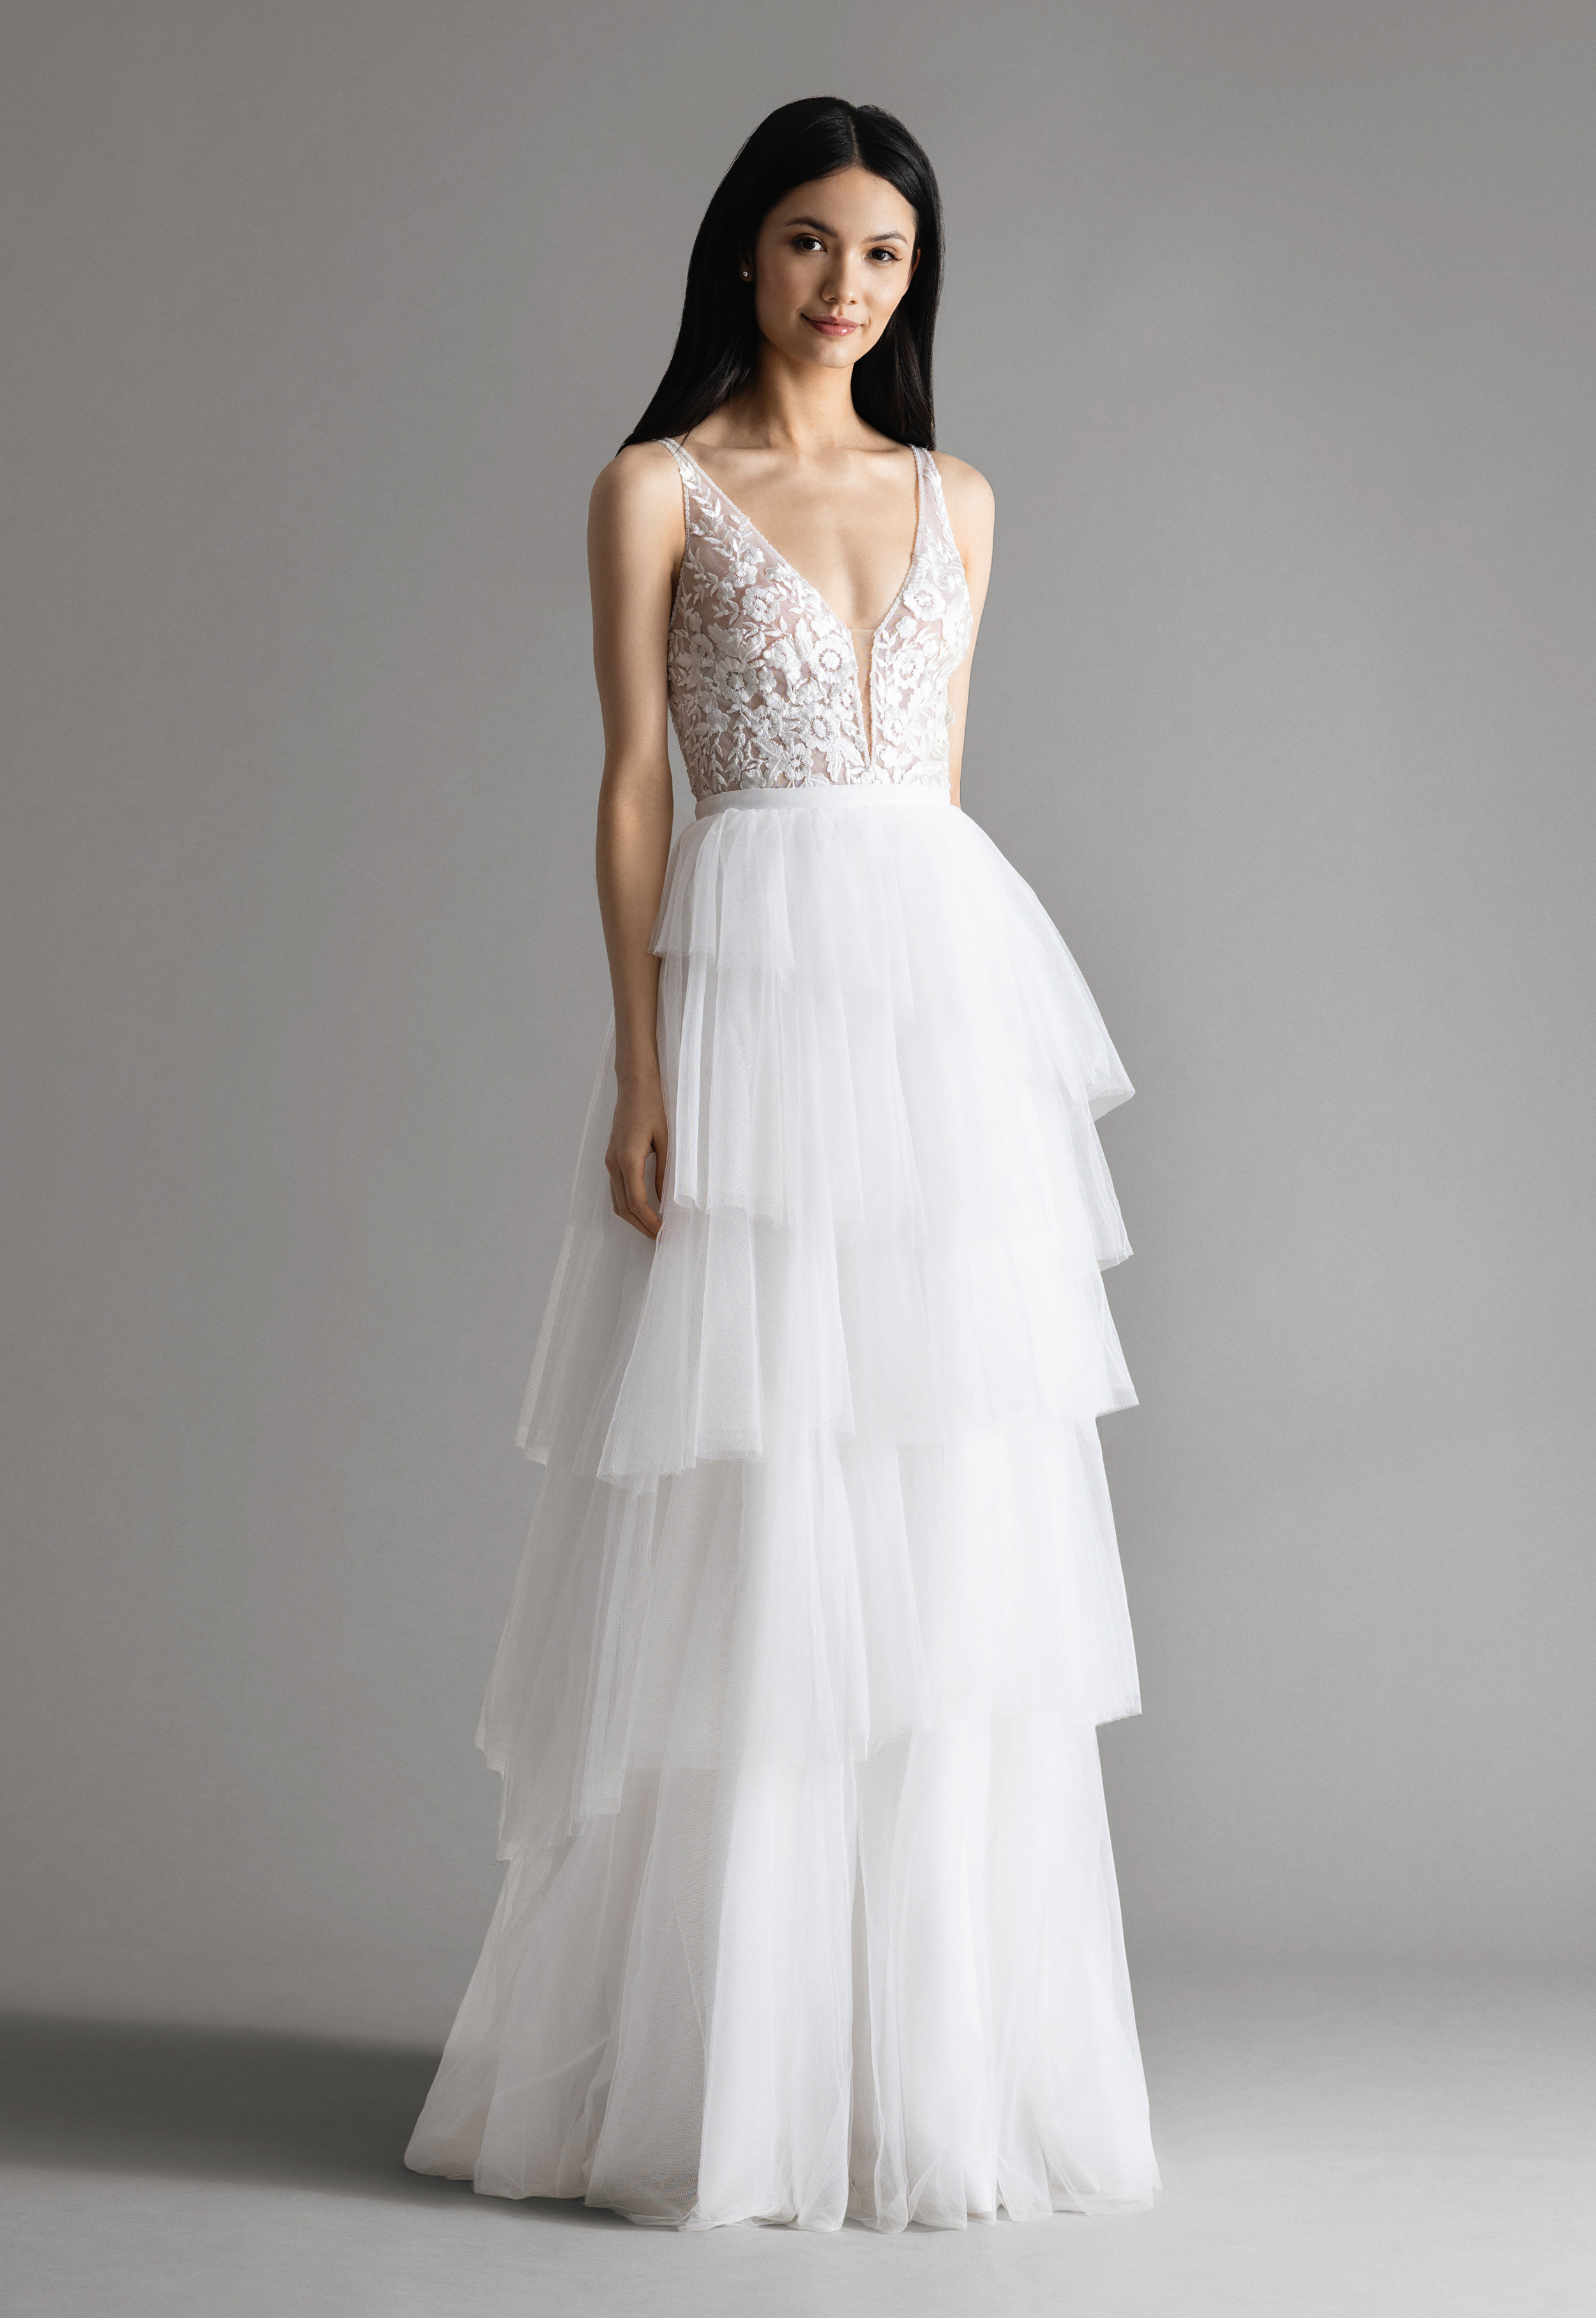 ti-adora-bridal-spring-2019-style-7909-eva.jpg